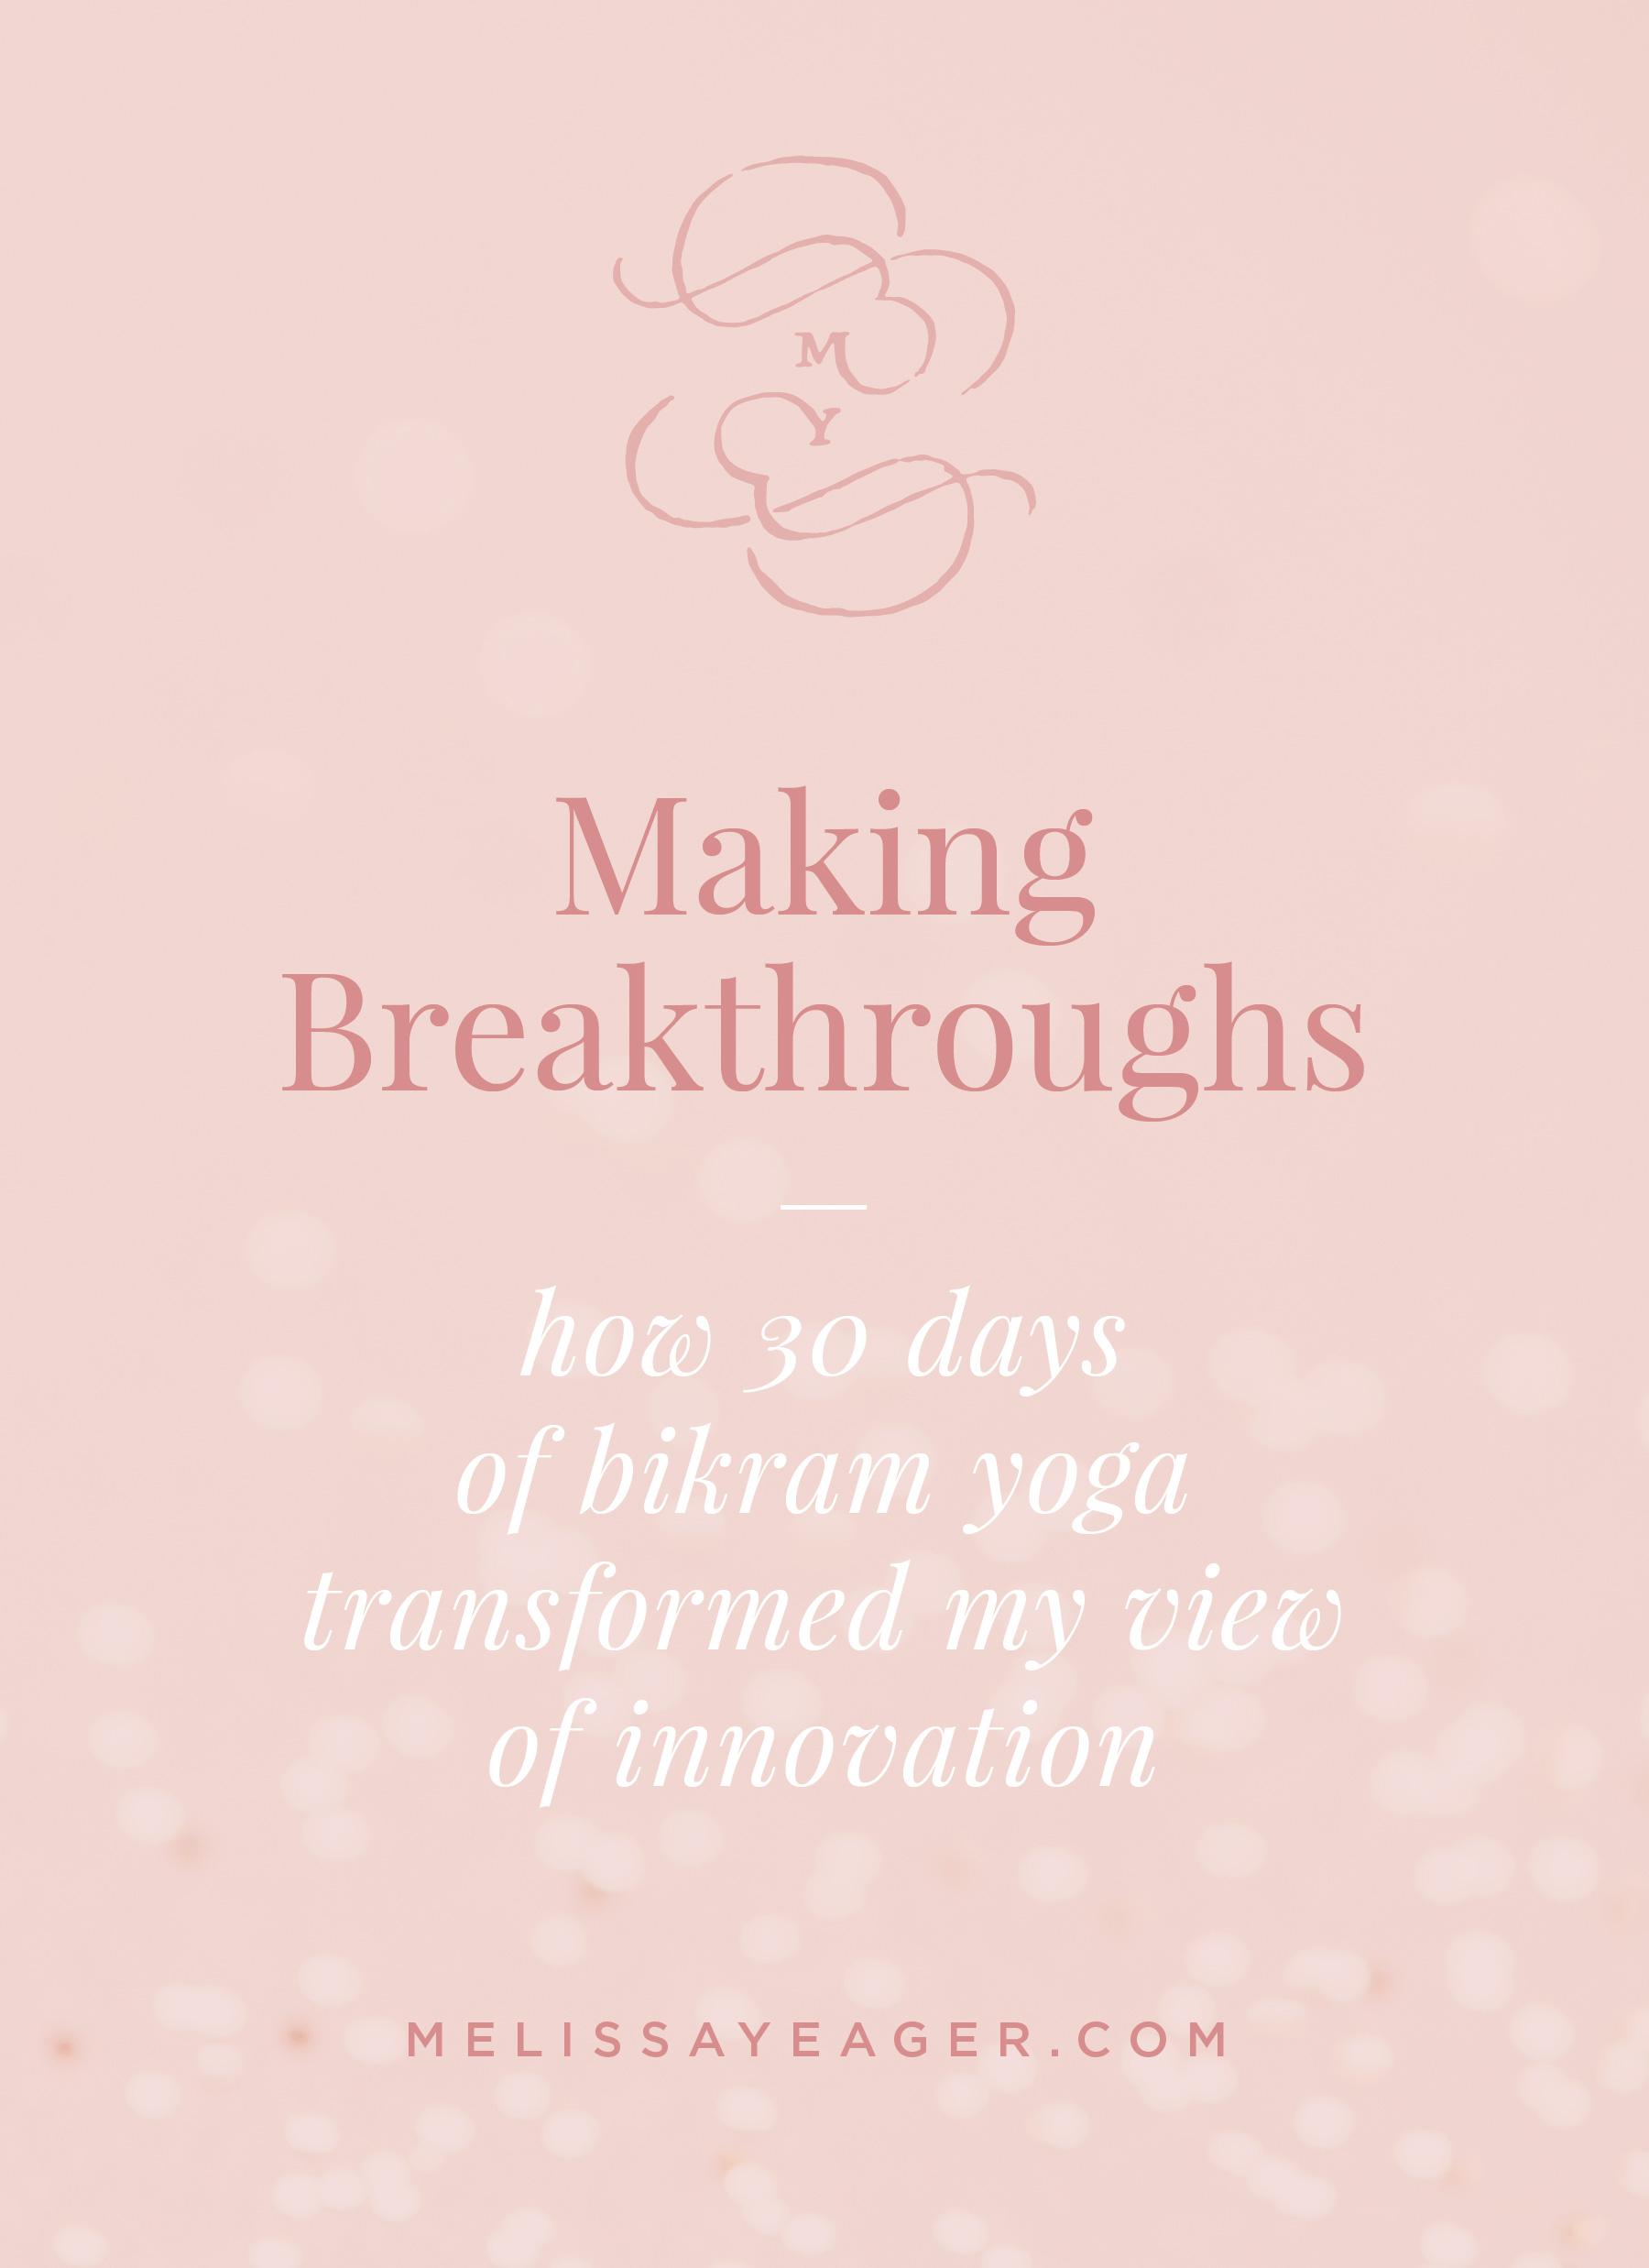 Making Breakthroughs - how 30 days of bikram yoga transformed my view of innovation